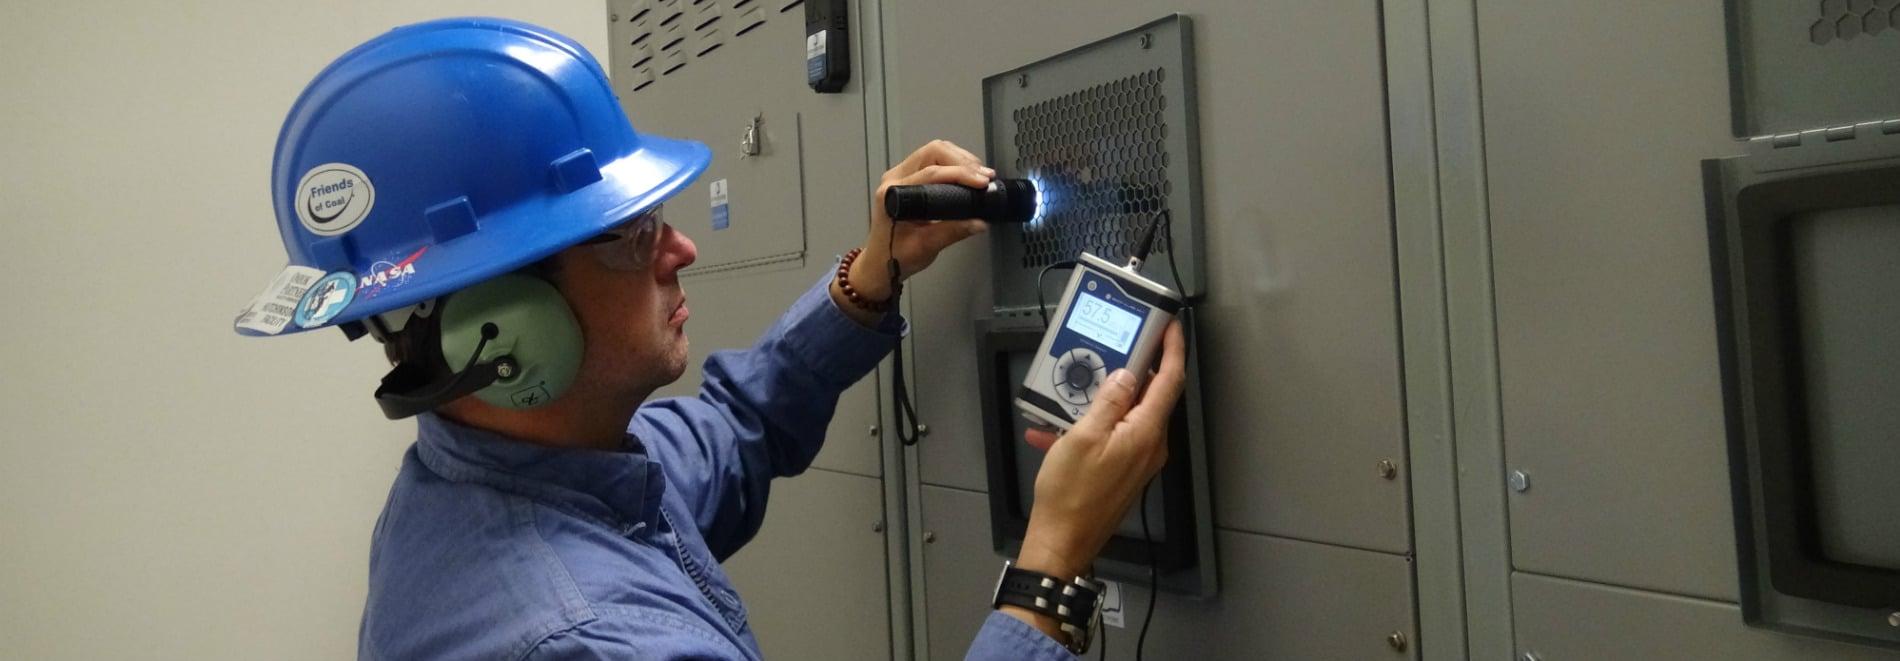 Condition-Based Maintenance Program